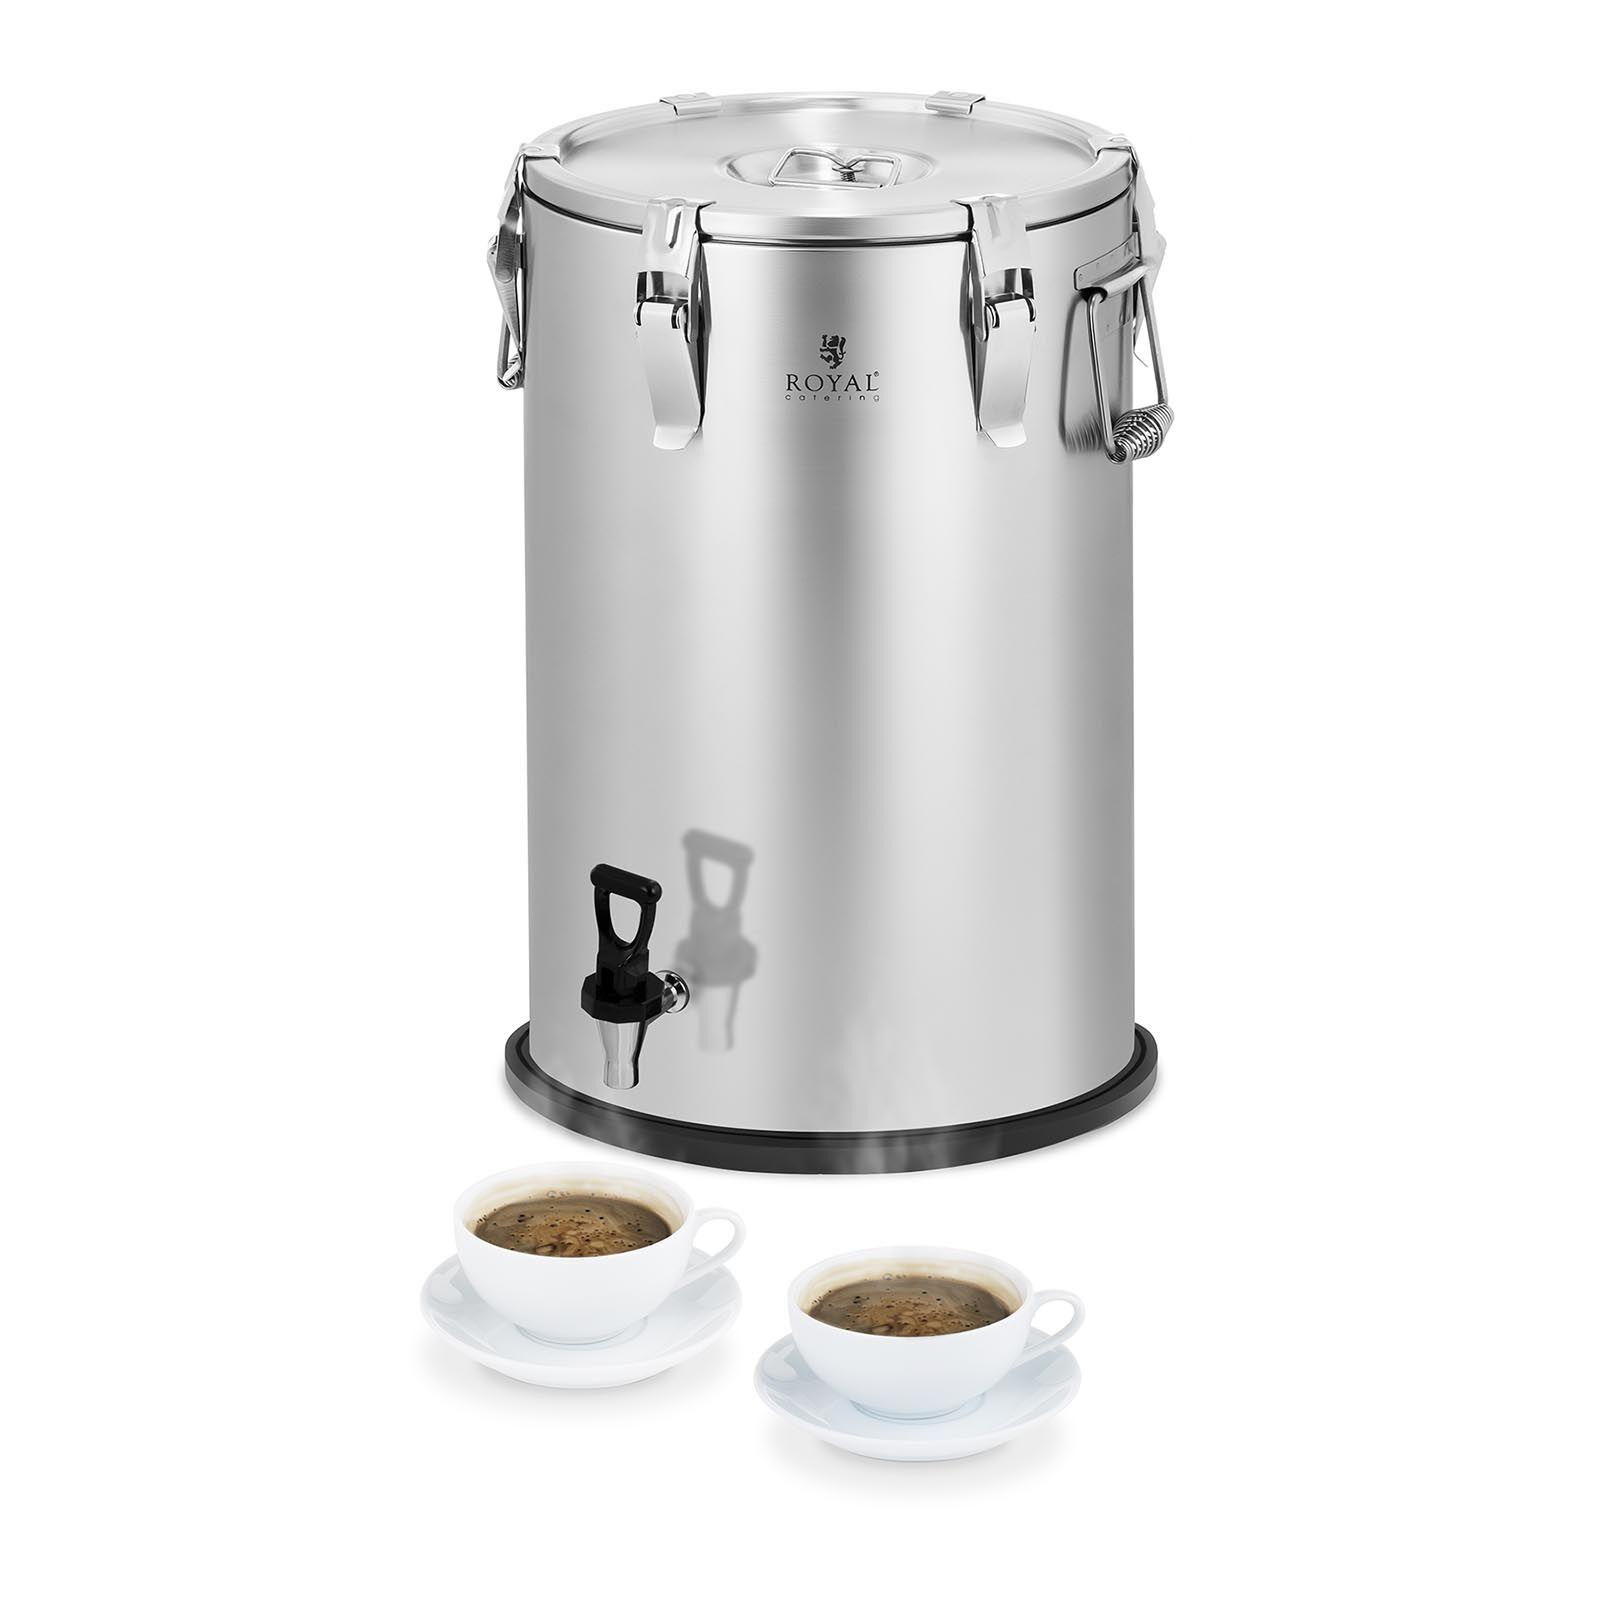 Royal Catering Conteneur isotherme - acier inoxydable - 35 L - avec robinet